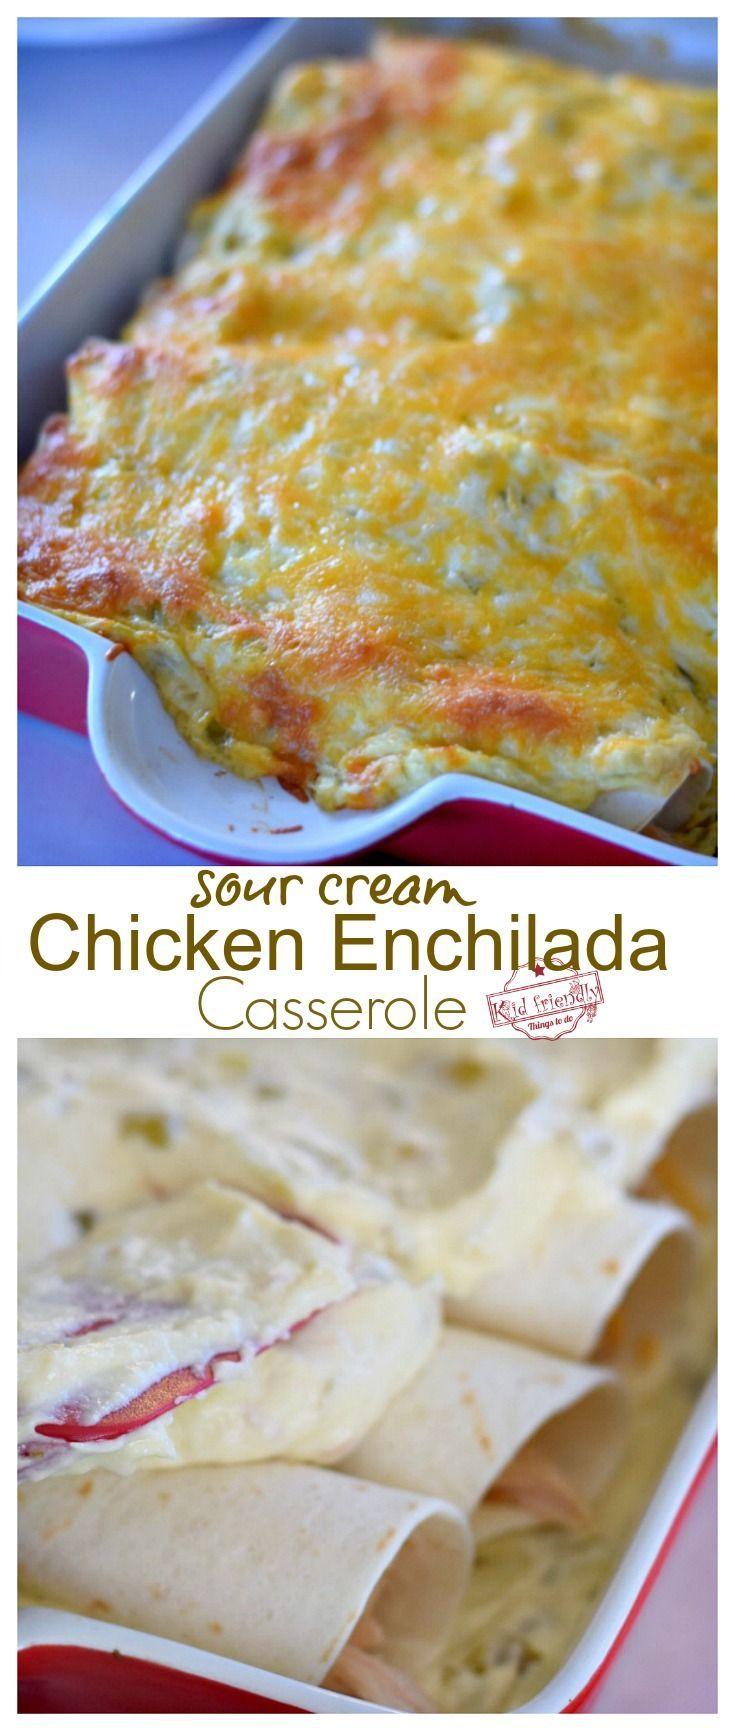 Easy Sour Cream Chicken Enchilada Casserole Recipe Just Like Mom Used To Make Recipe Enchilada Casserole Recipes Chicken Enchilada Casserole Recipe Chicken Enchilada Casserole